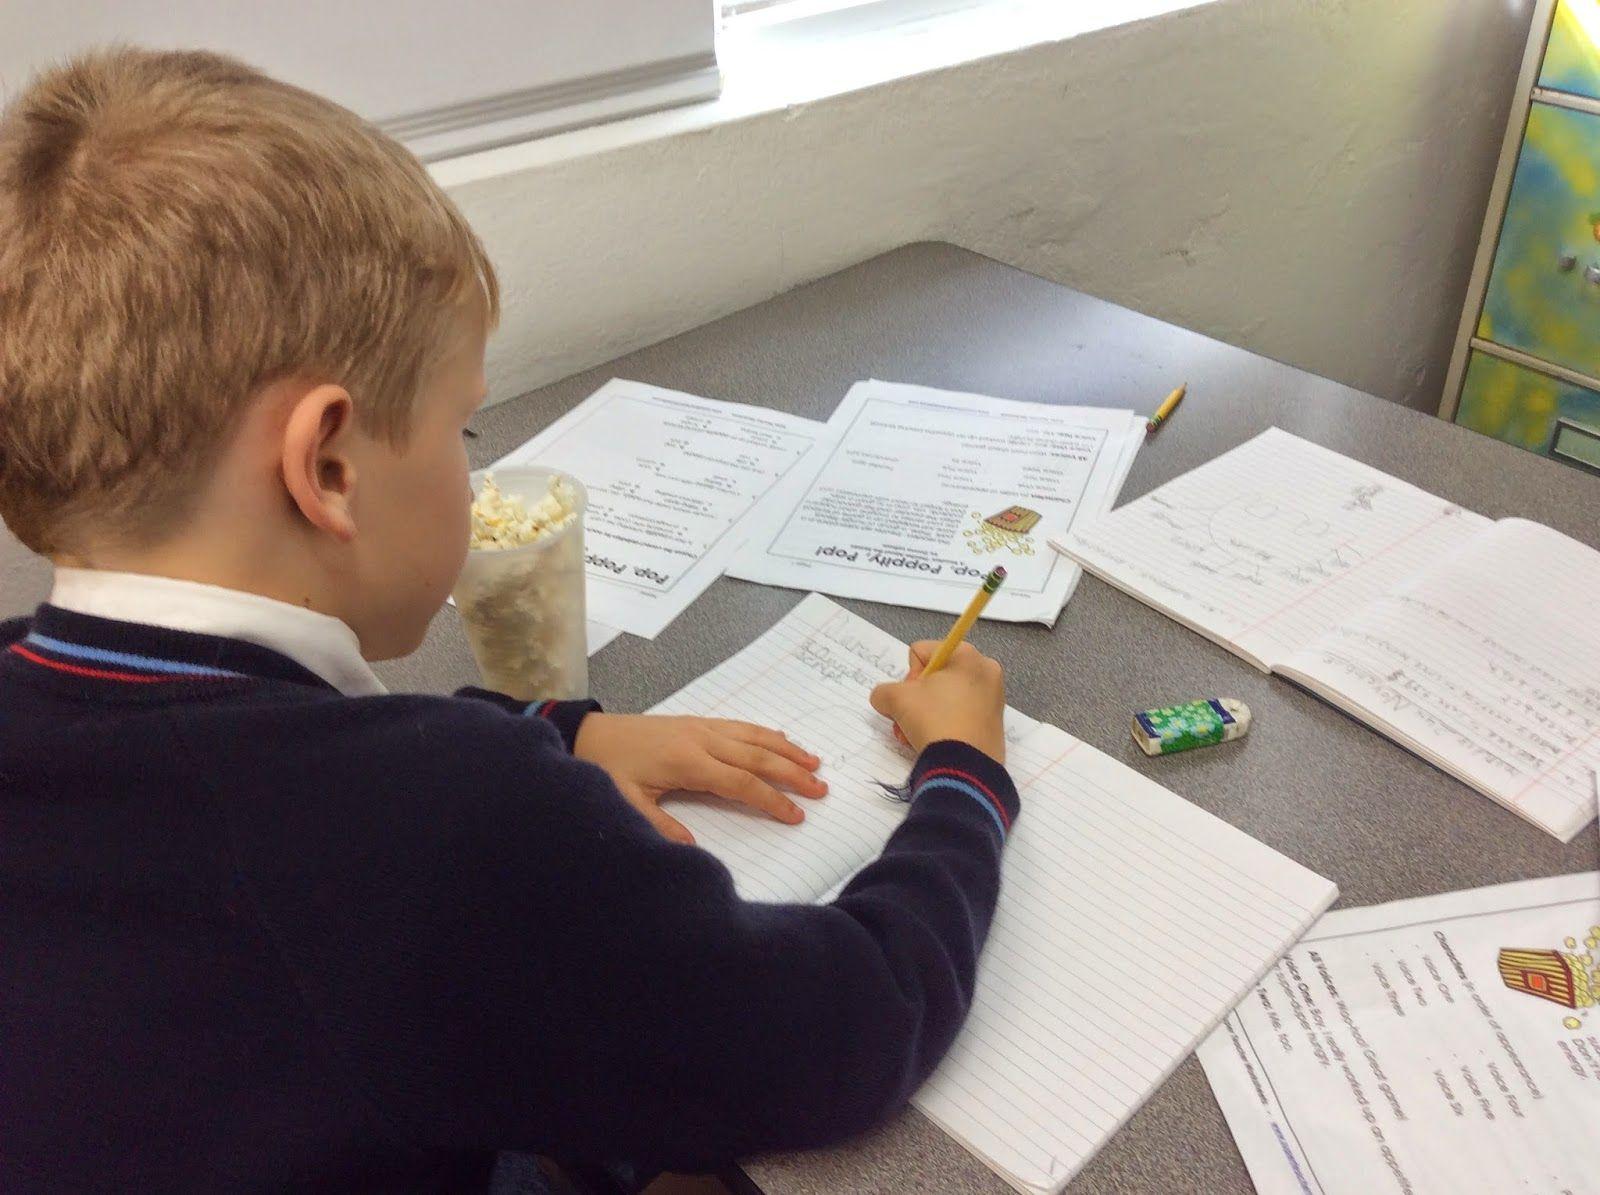 April 2015 Super Teacher Worksheets Literacy Resource Primary School Teacher